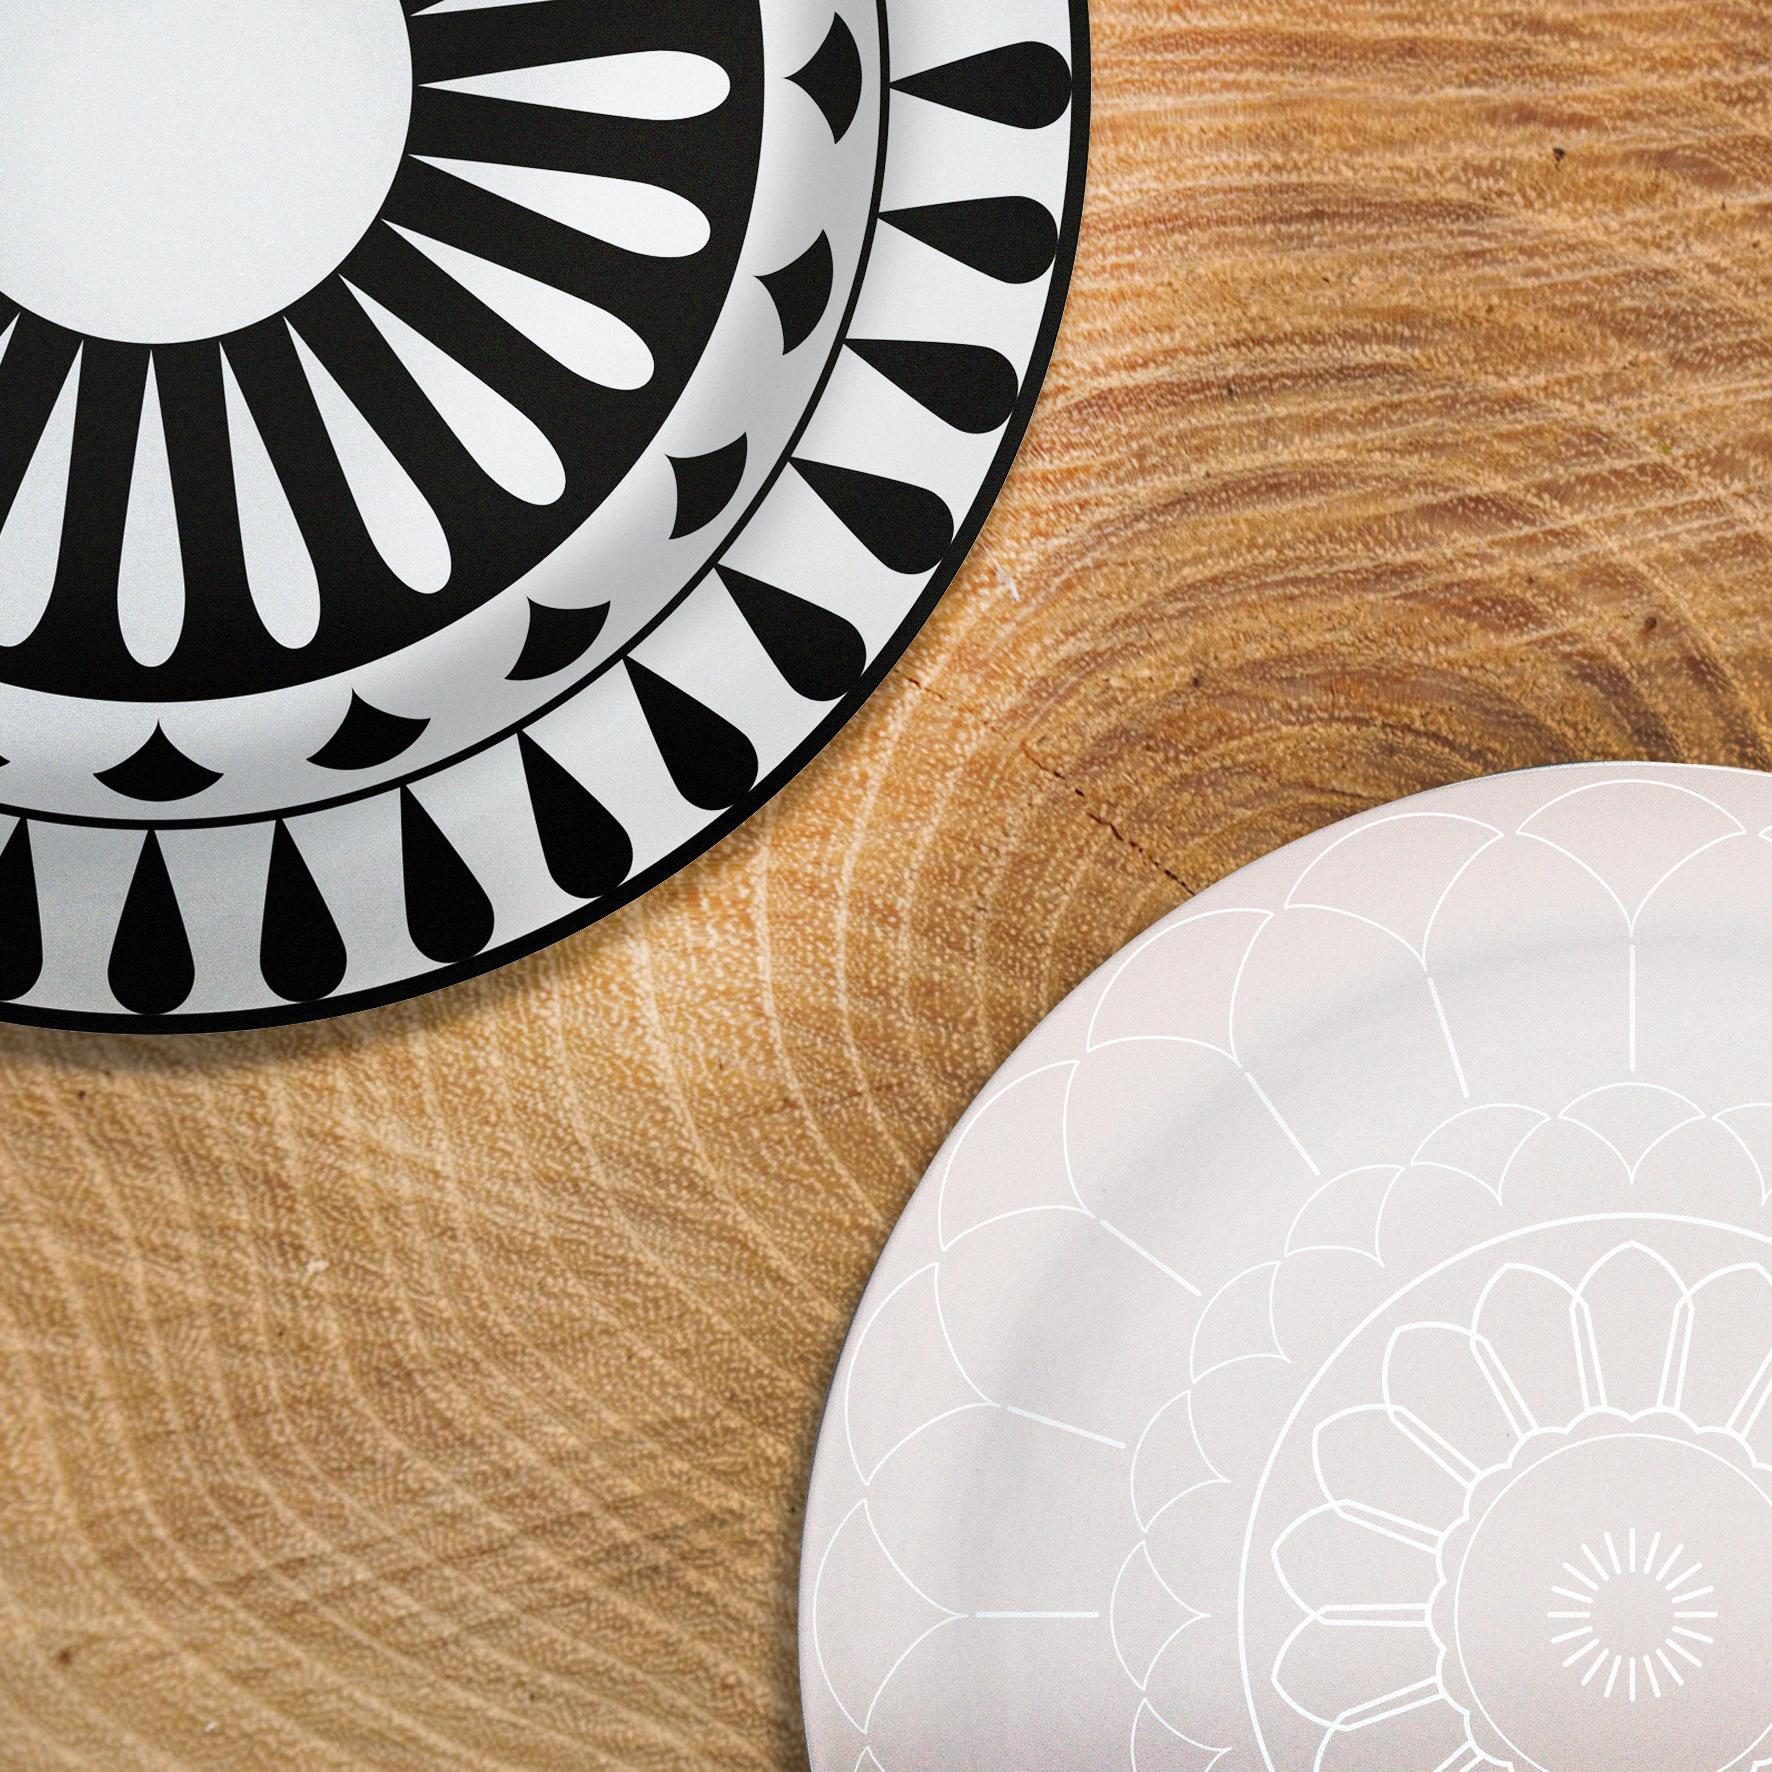 Design et artisanat par Studio Tandem par Design Maroc